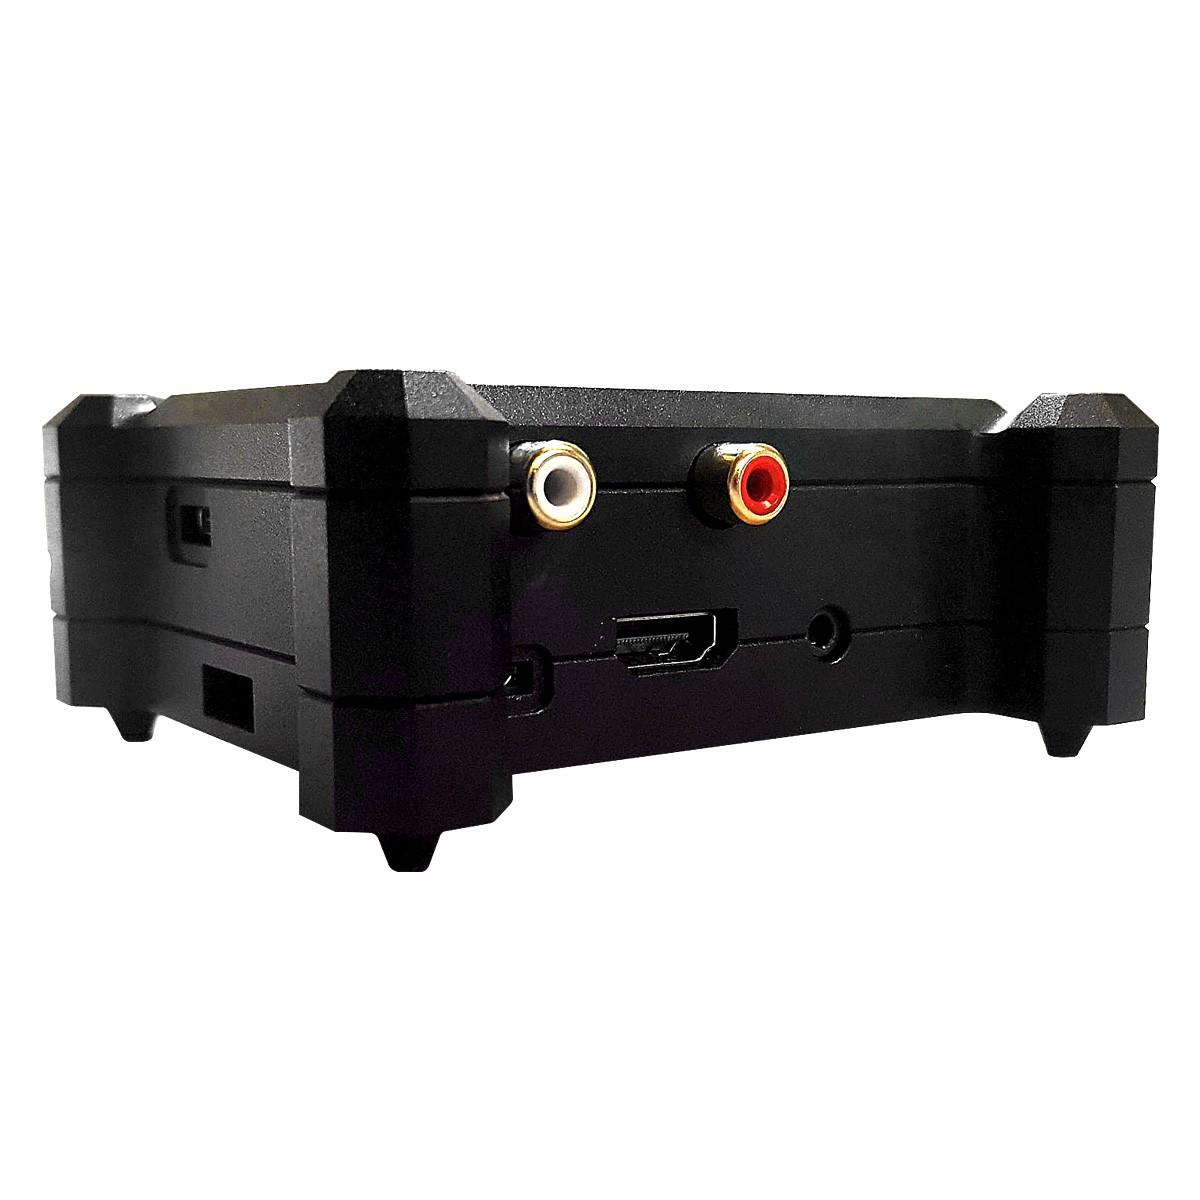 ALLO Boîtier aluminium pour DAC Allo Boss et Raspberry Pi 3 B/B+ Noir